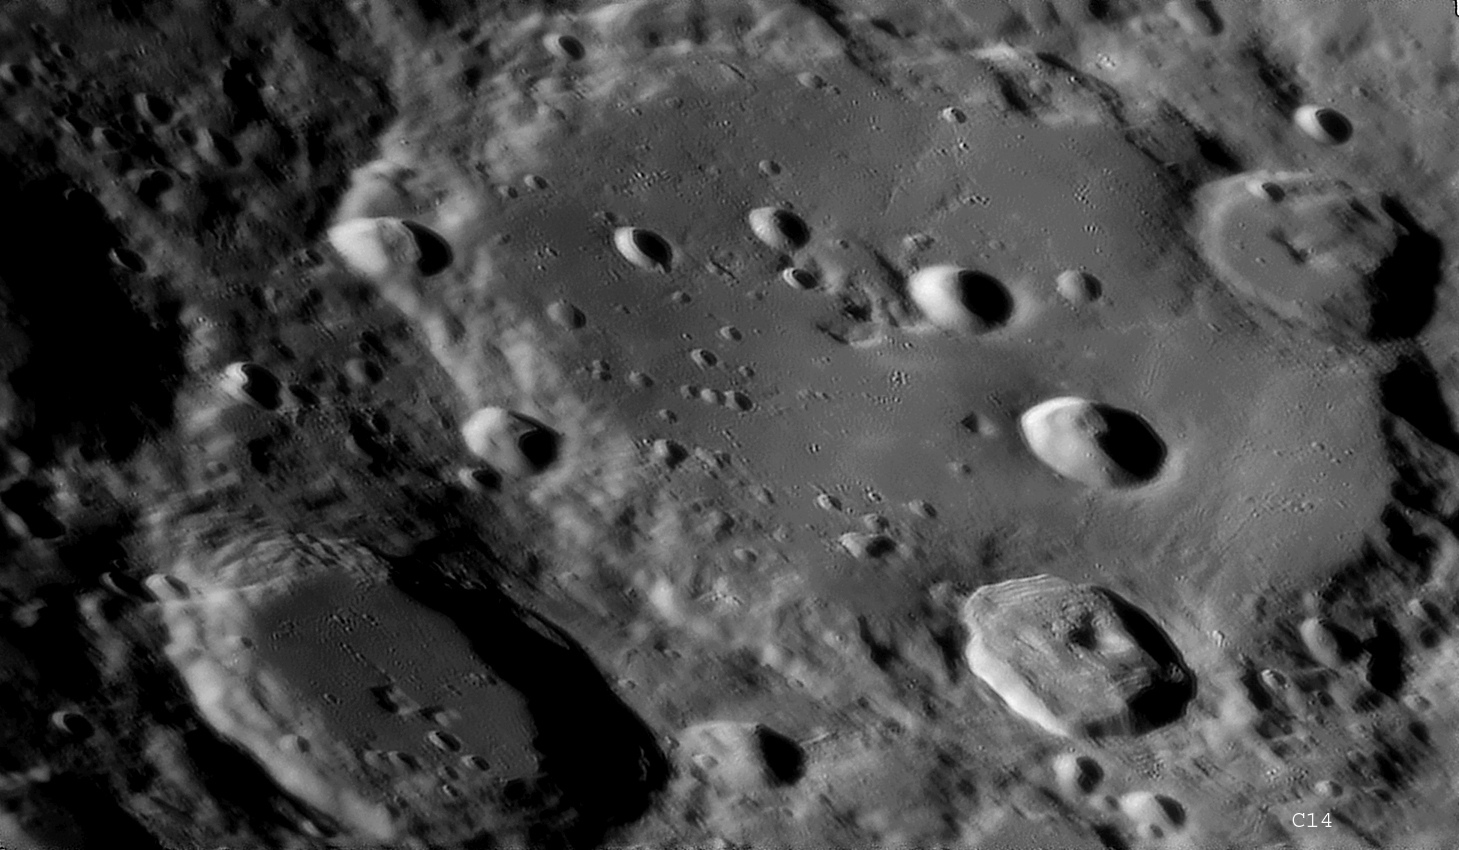 large.Moon_03_04_2020_20_48_C14-r.jpg.e43cdb78e8066e854ad09cd2a36c2287.jpg